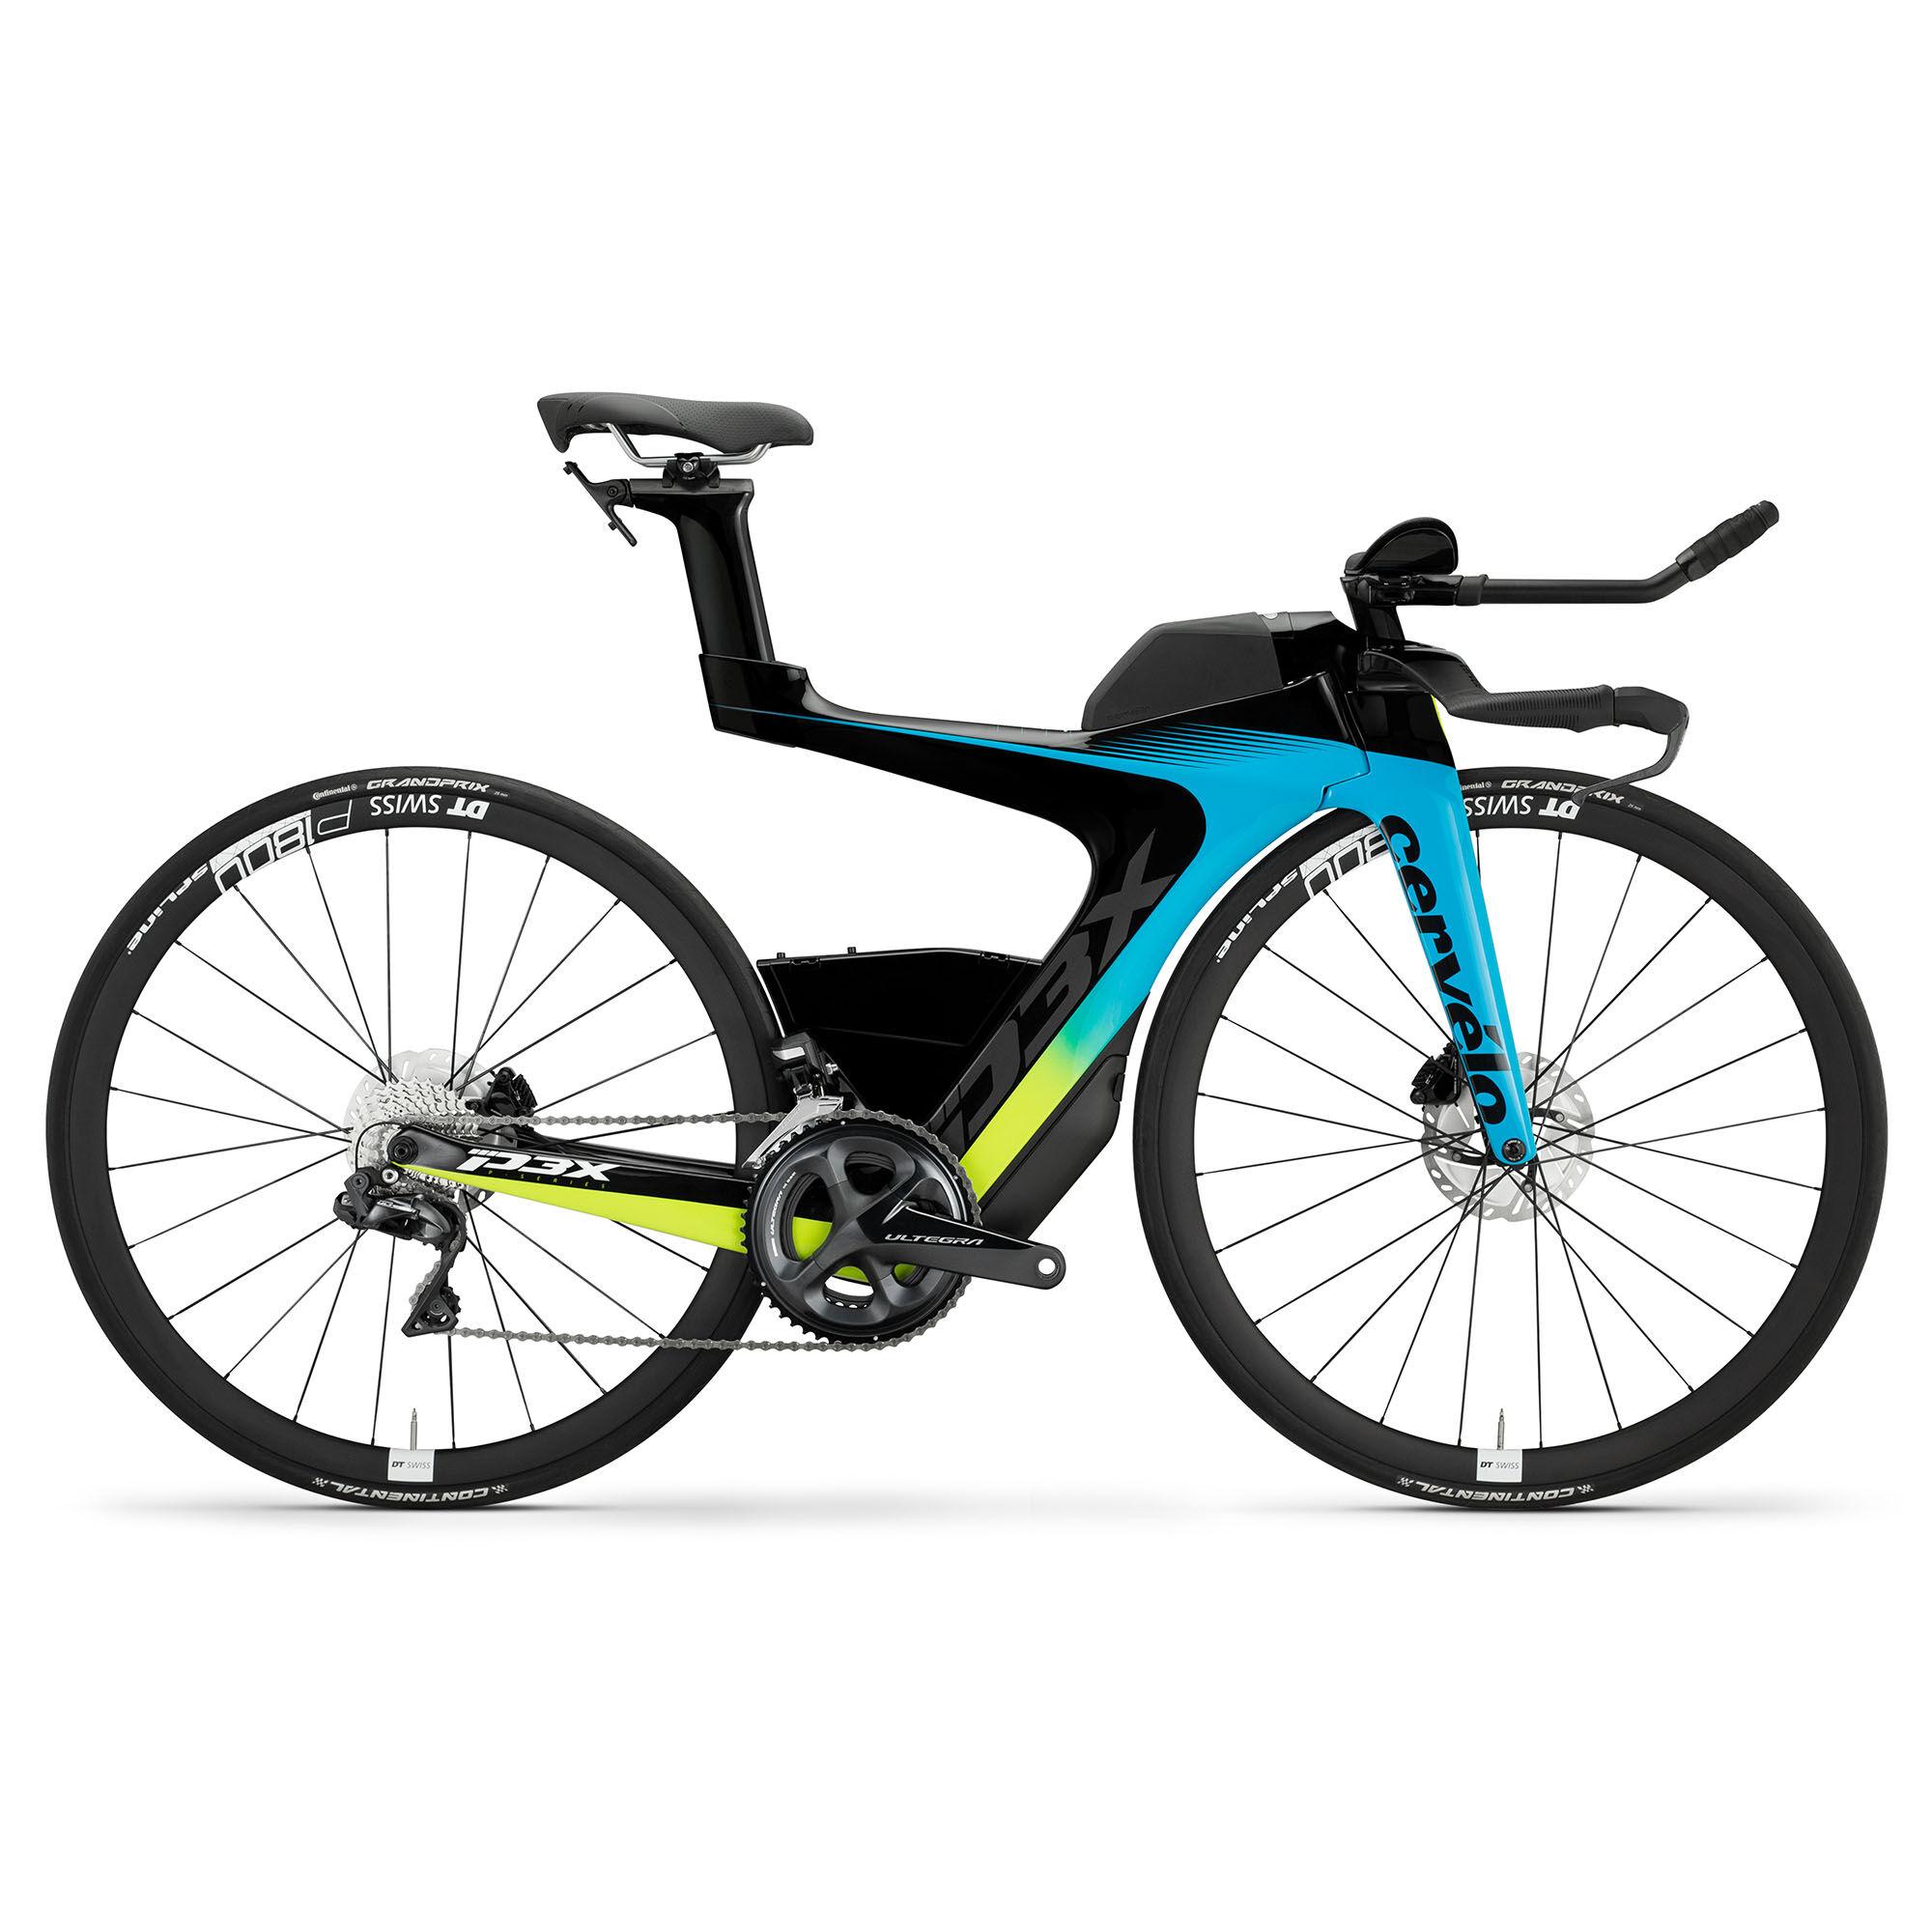 Cervelo P3X Ultegra DI2 Triathlon Bike '20  - Riviera/Fluoro/Black - Size: Large